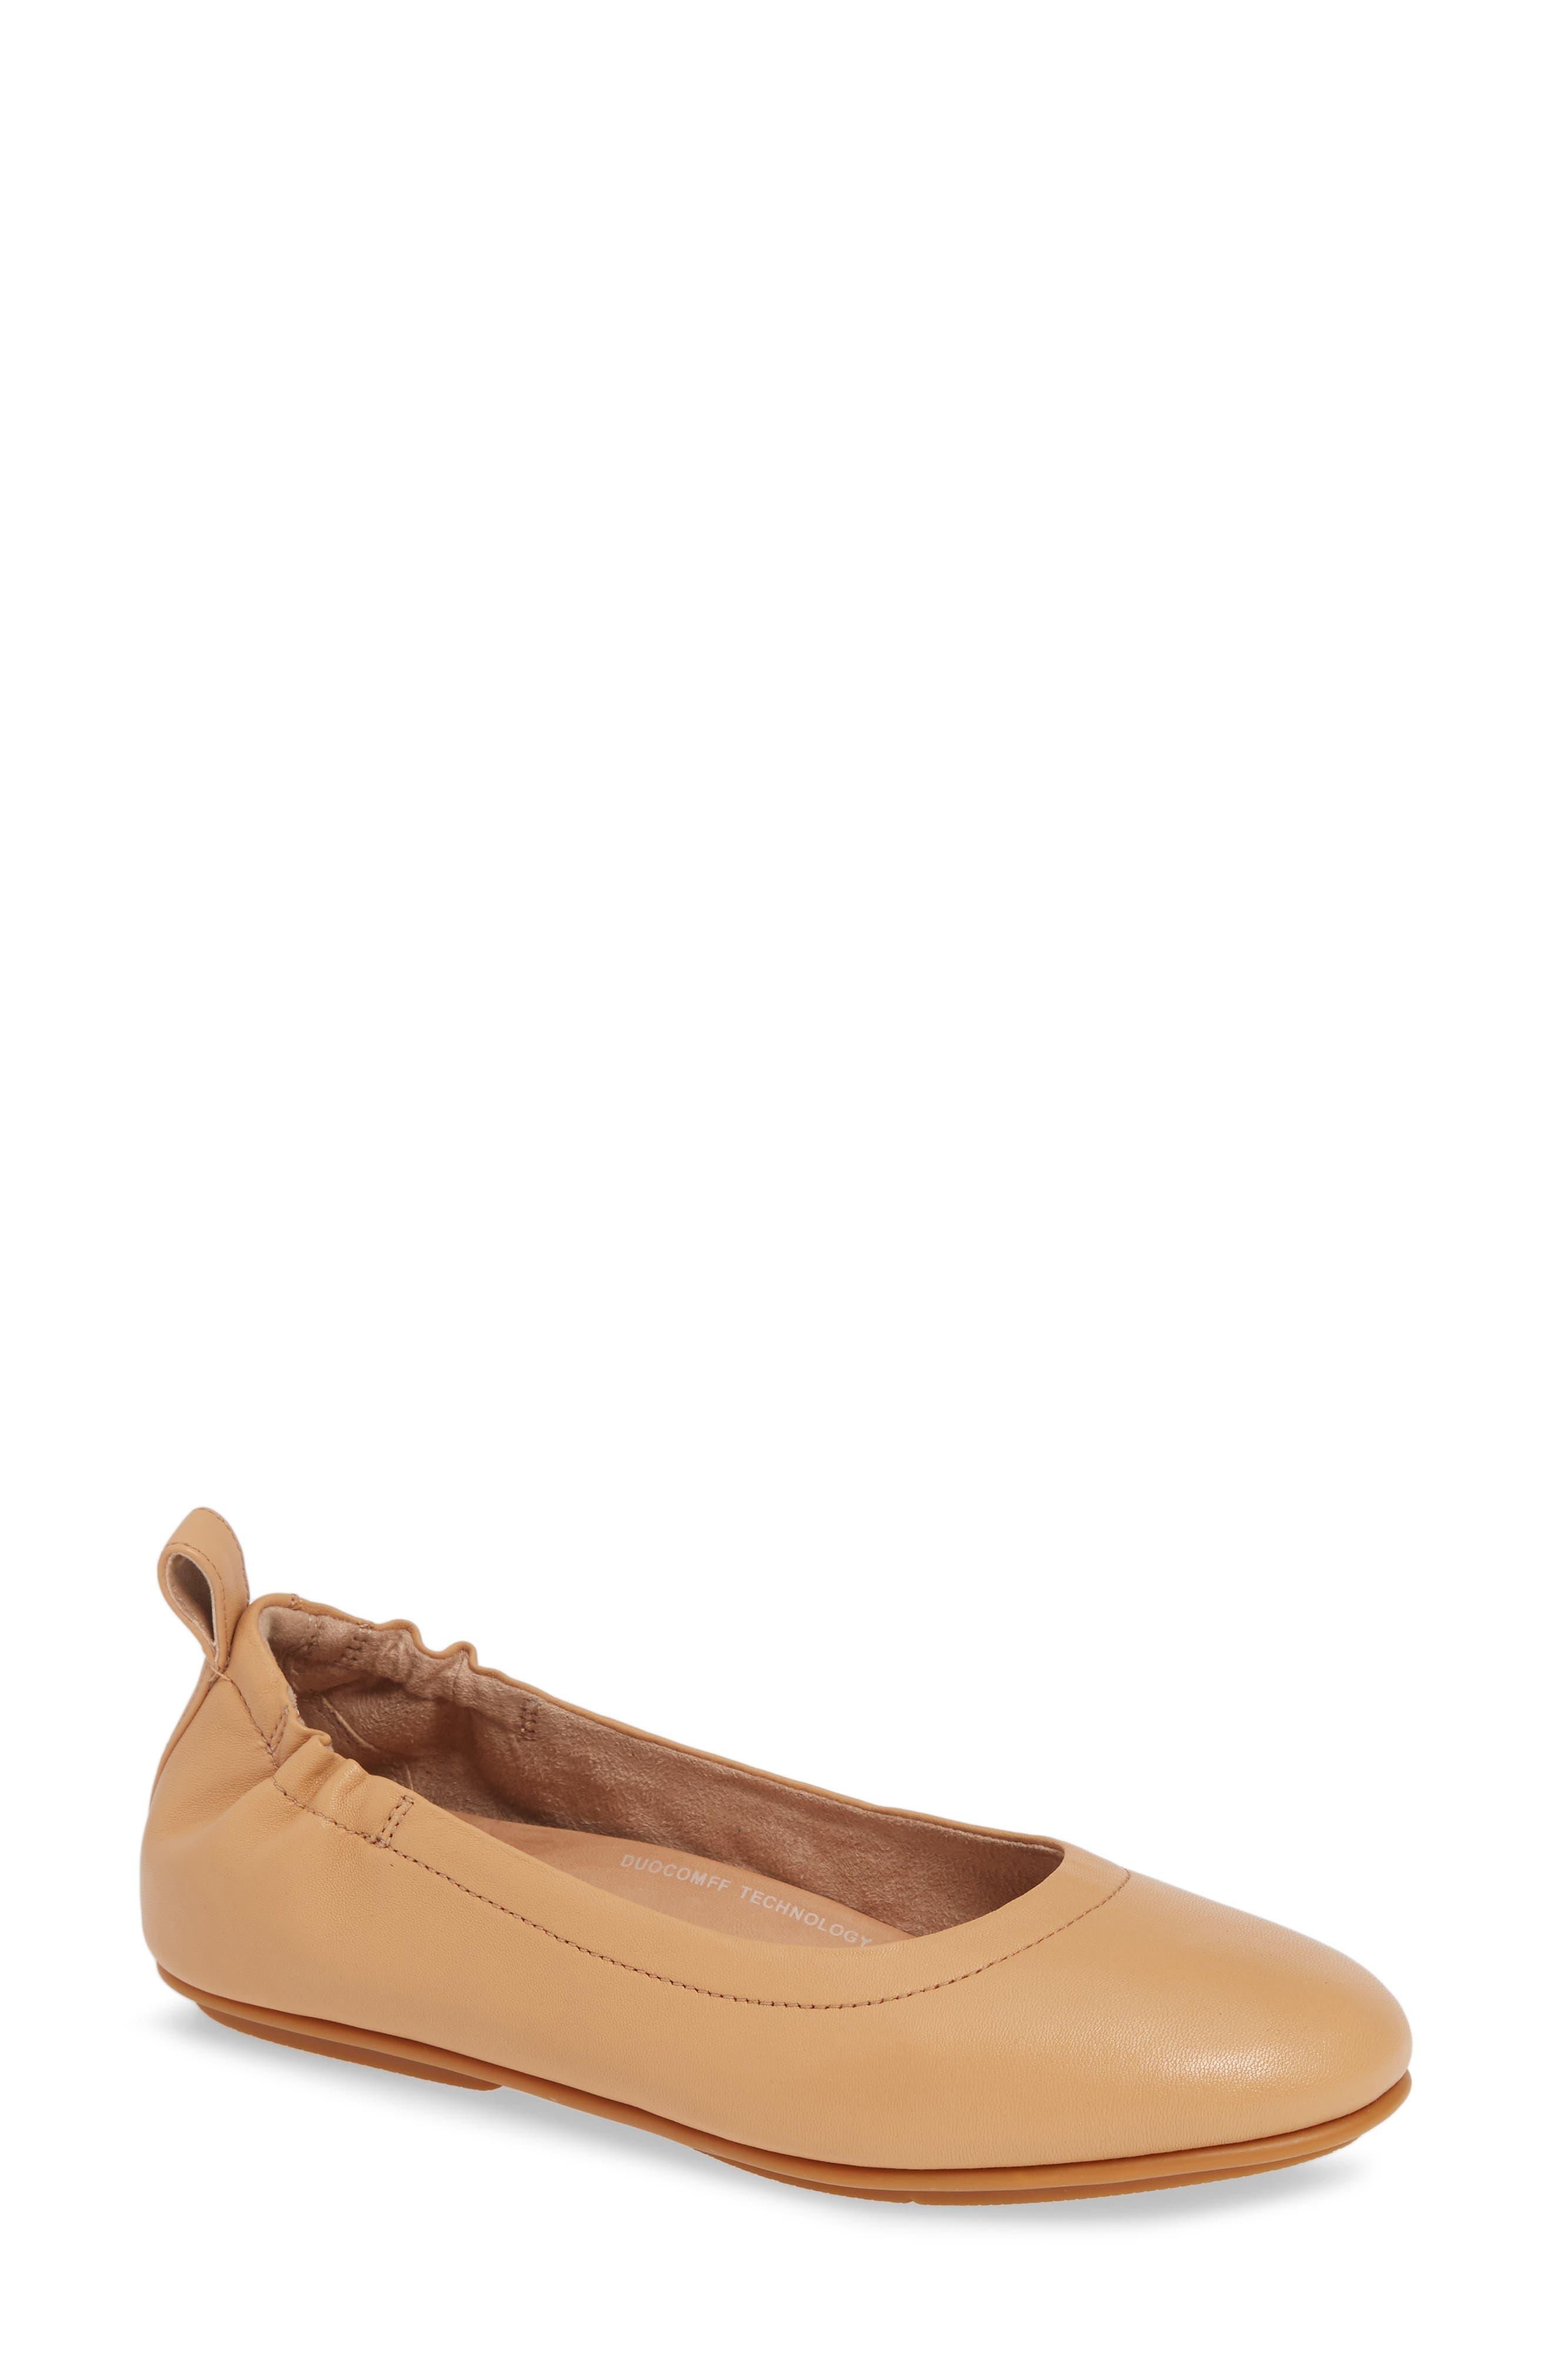 FitFlop Allegro Ballet Flat (Women)